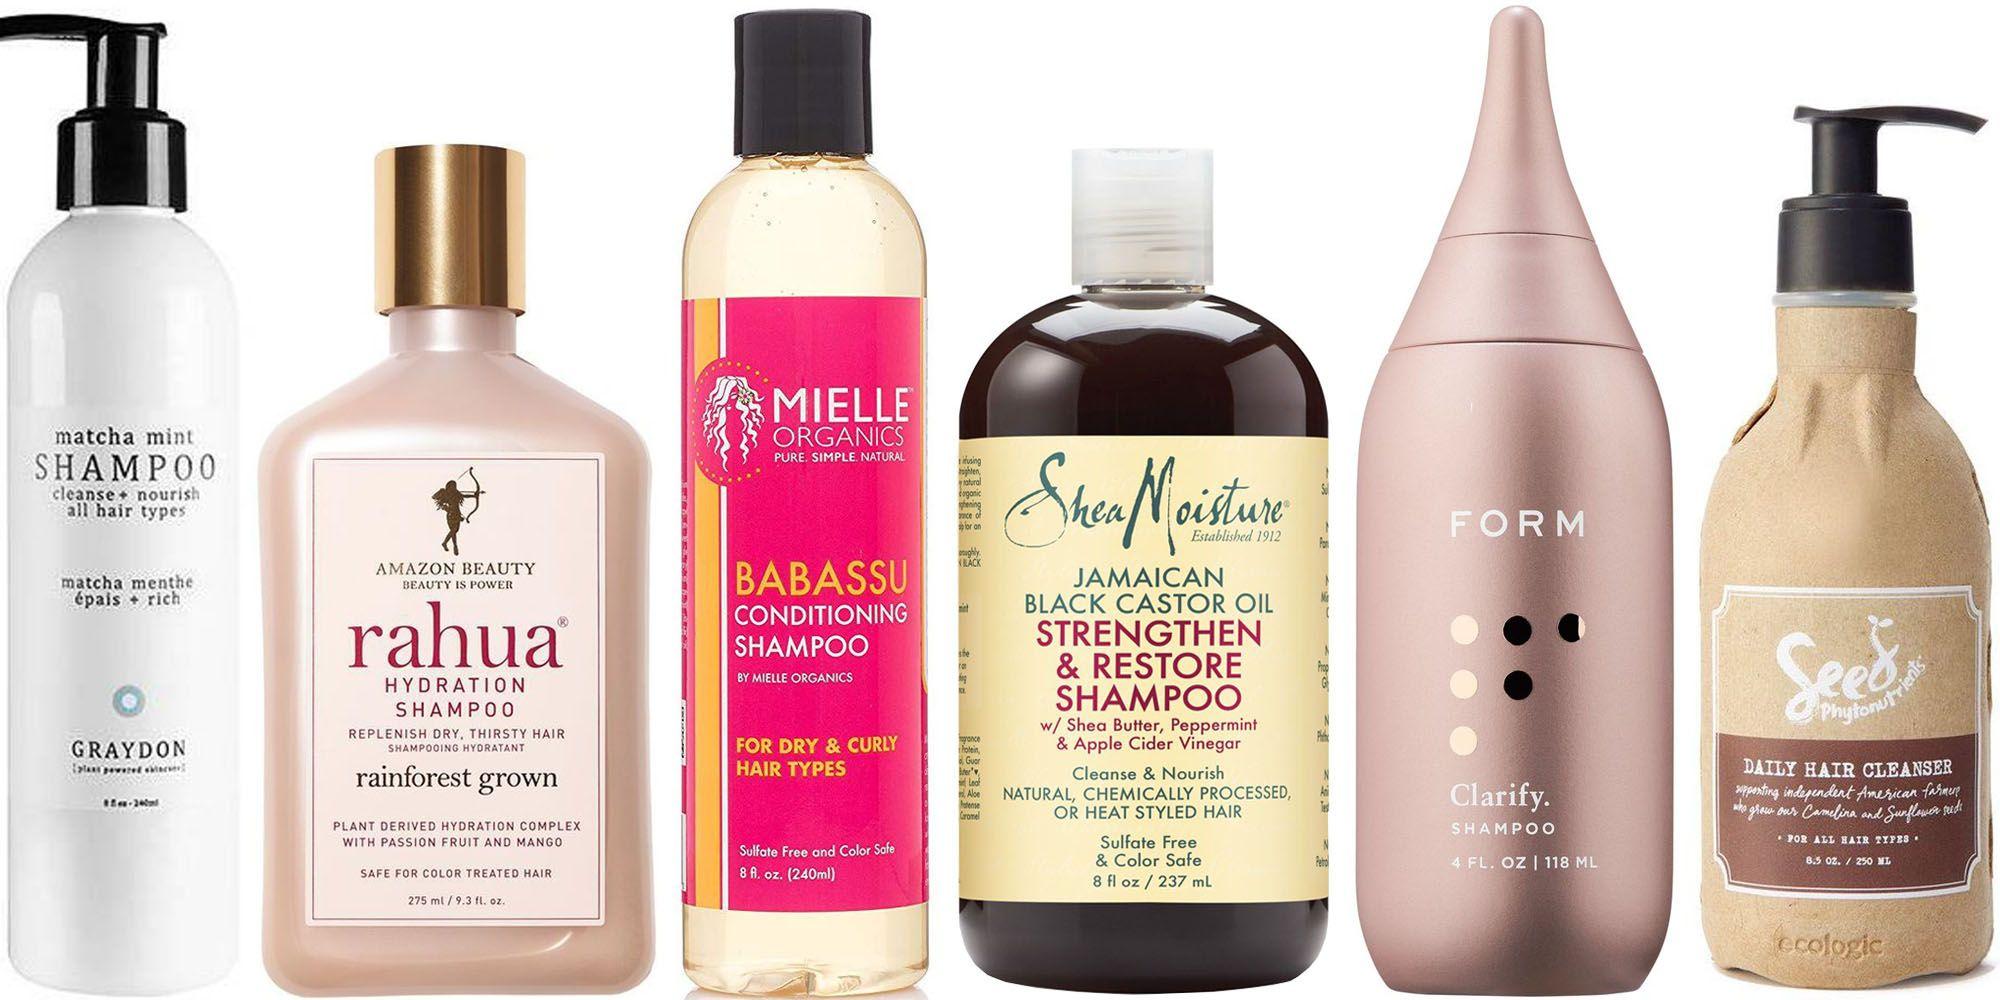 14 Best Organic Natural Shampoo All Natural And Non Toxic Shampoos